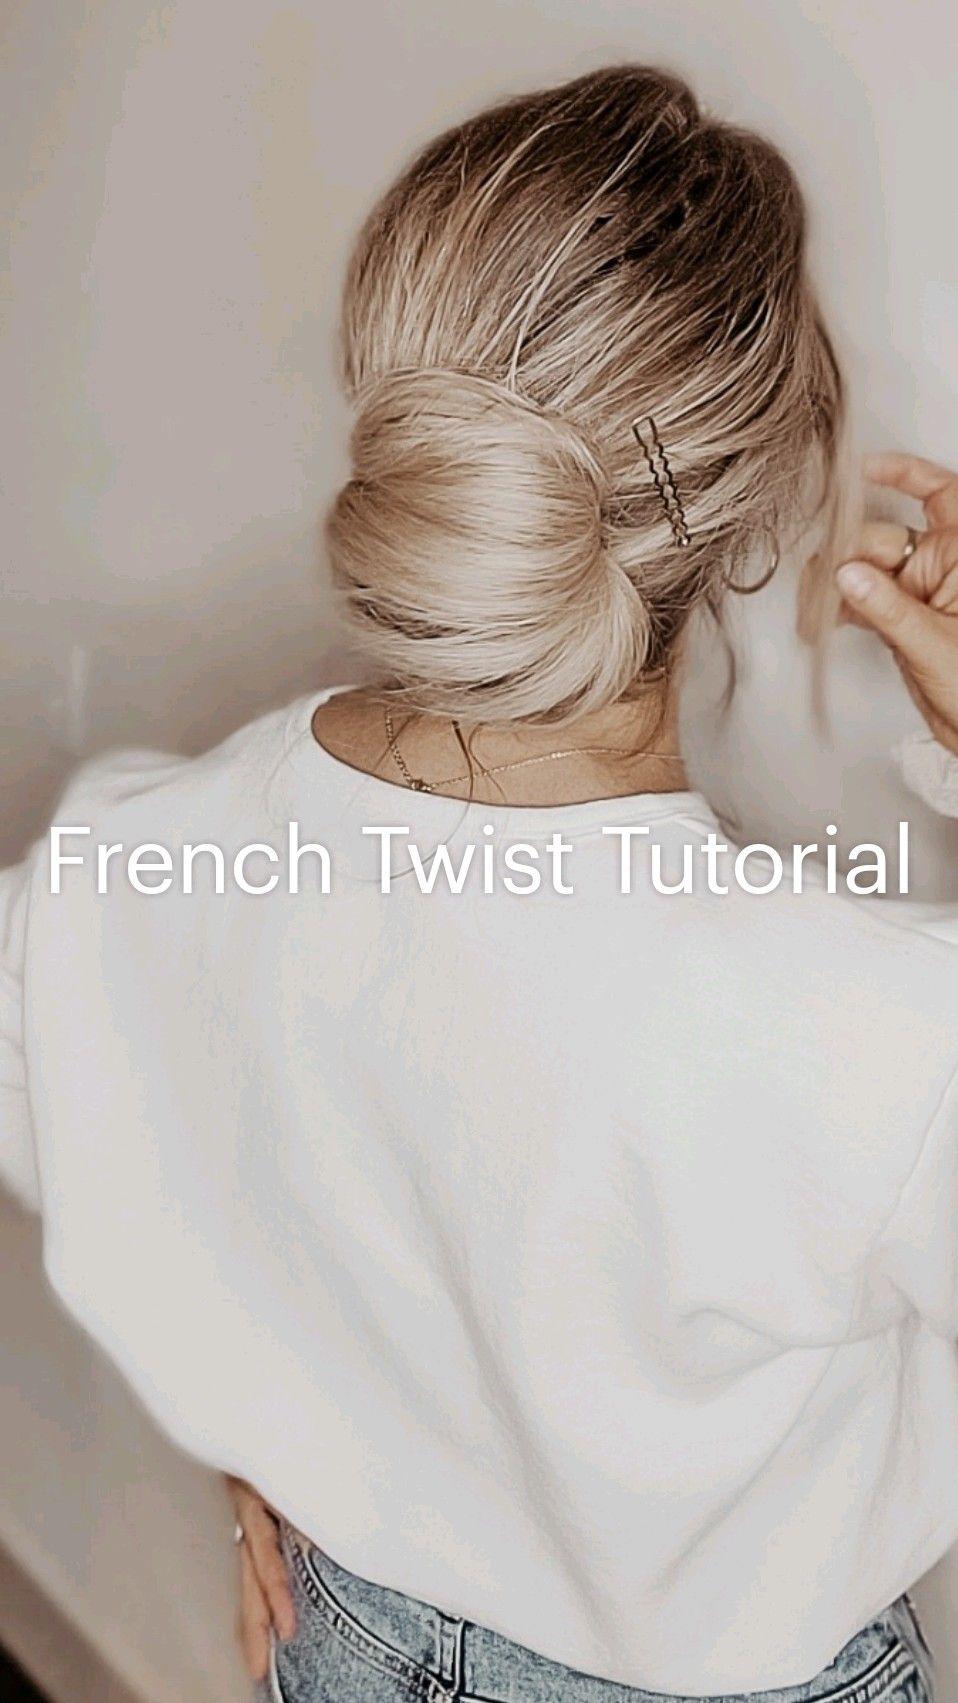 French Twist Tutorial